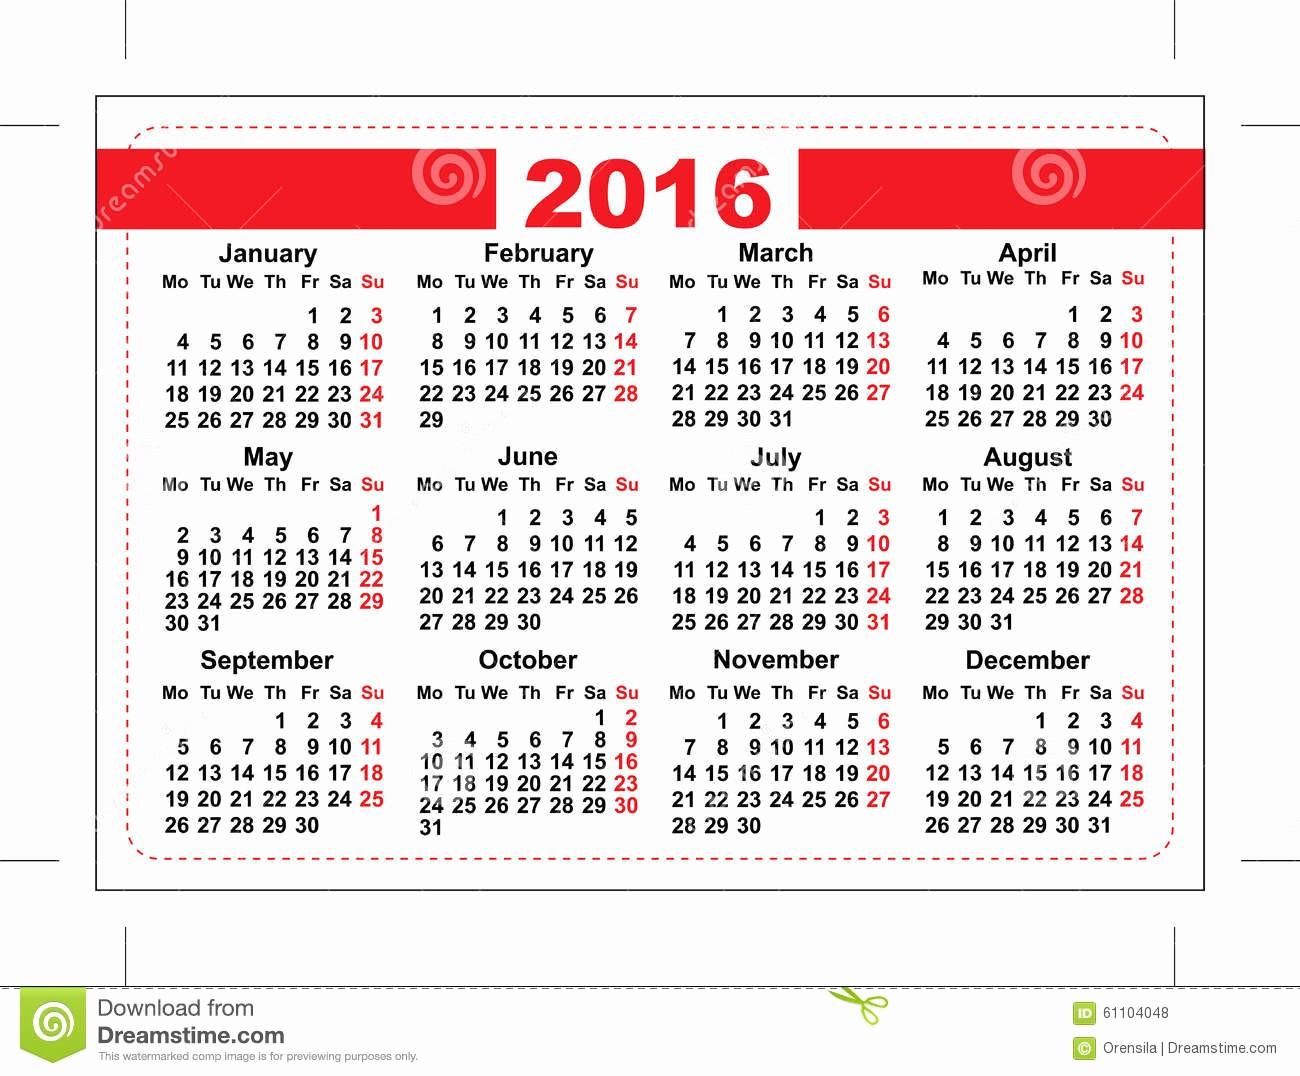 Days Of the Week Horizontal Fresh 2016 Pocket Calendar Template Grid Horizontal